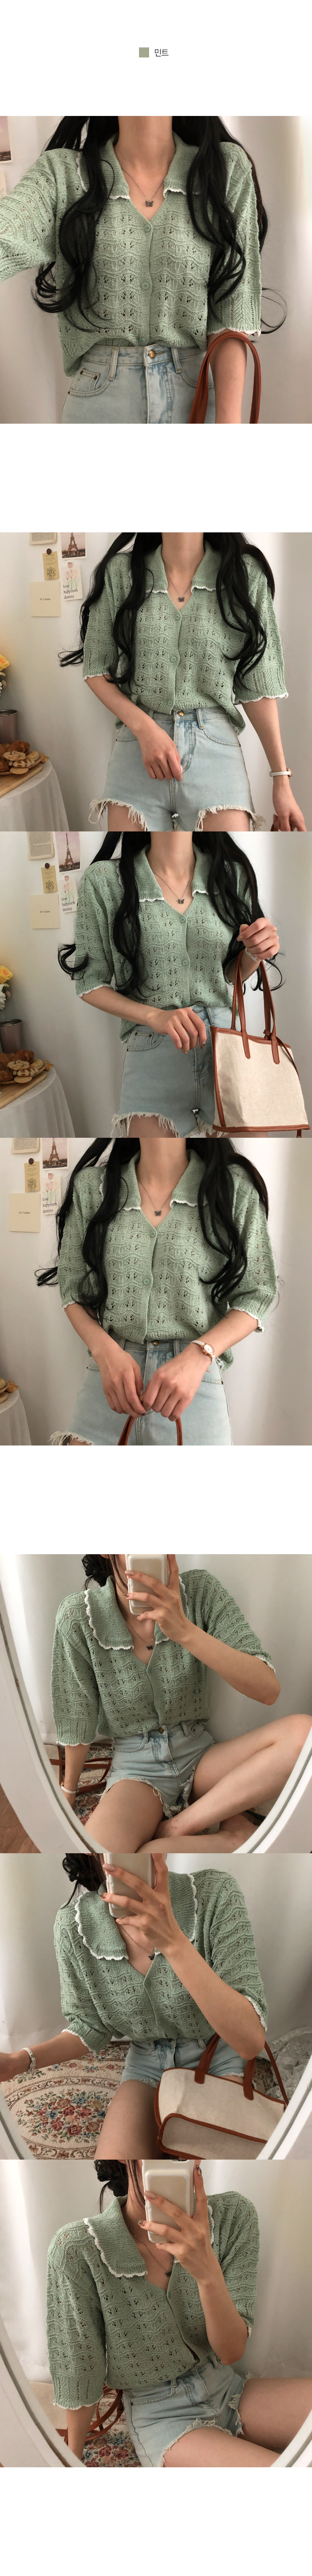 Romhee SCSI color matching collar cardigan